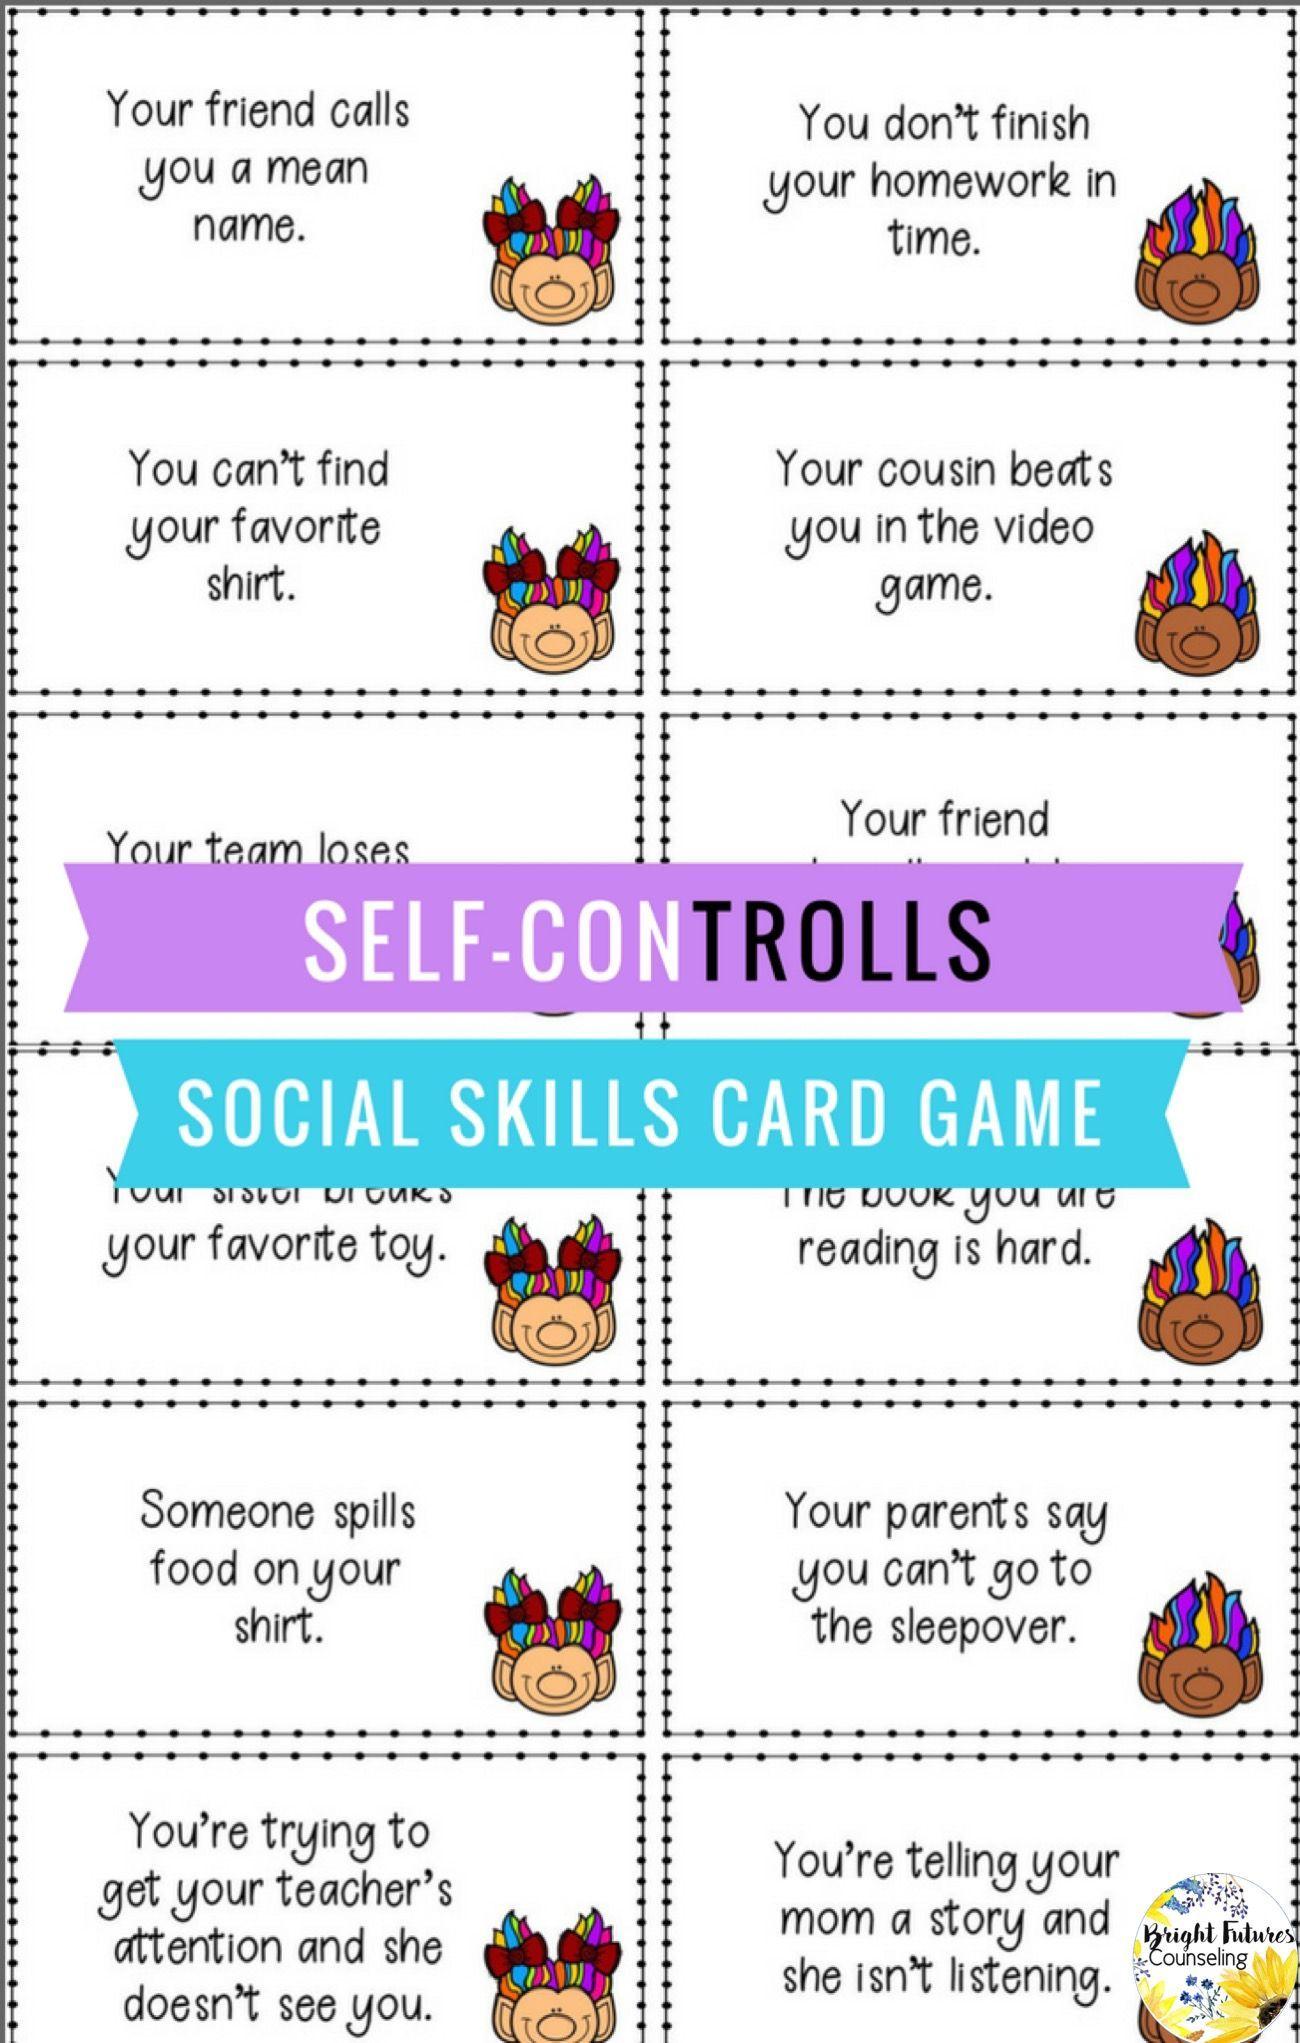 Self Control Social Skills Card Game Self Controlls